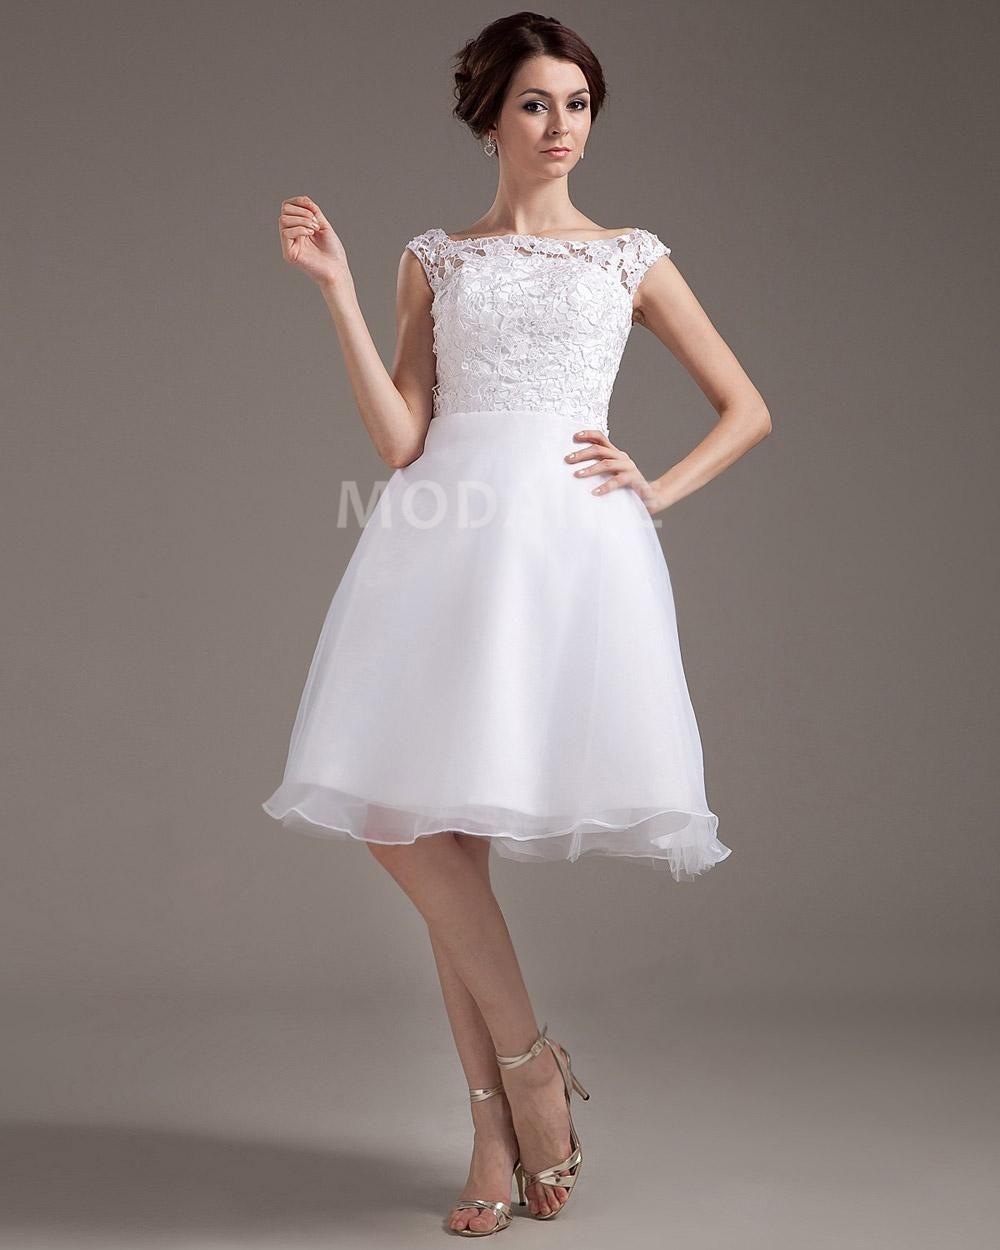 Short Wedding Dresses Styles Cheap Online Half Sleeve Court Lace Dress Ivory A Line Chiffon Krikor: Cher Short Sleeves Wedding Dresses At Websimilar.org